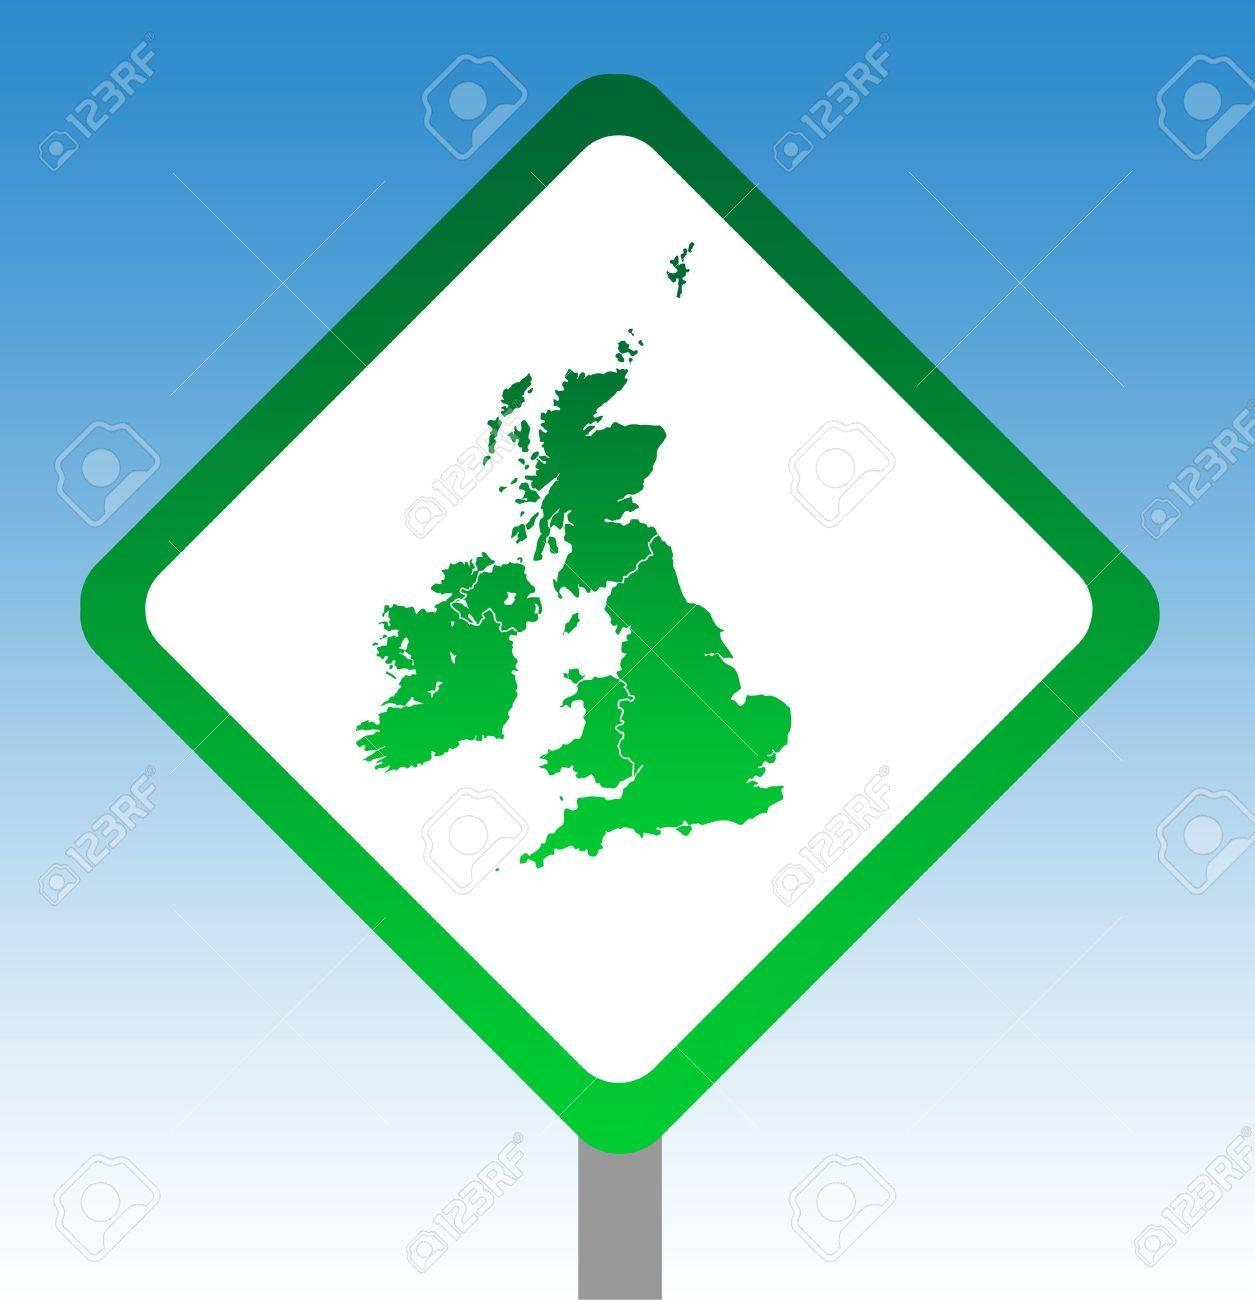 United Kingdom and Ireland map road sign isolated on graduated sky background. Stock Photo - 6584183